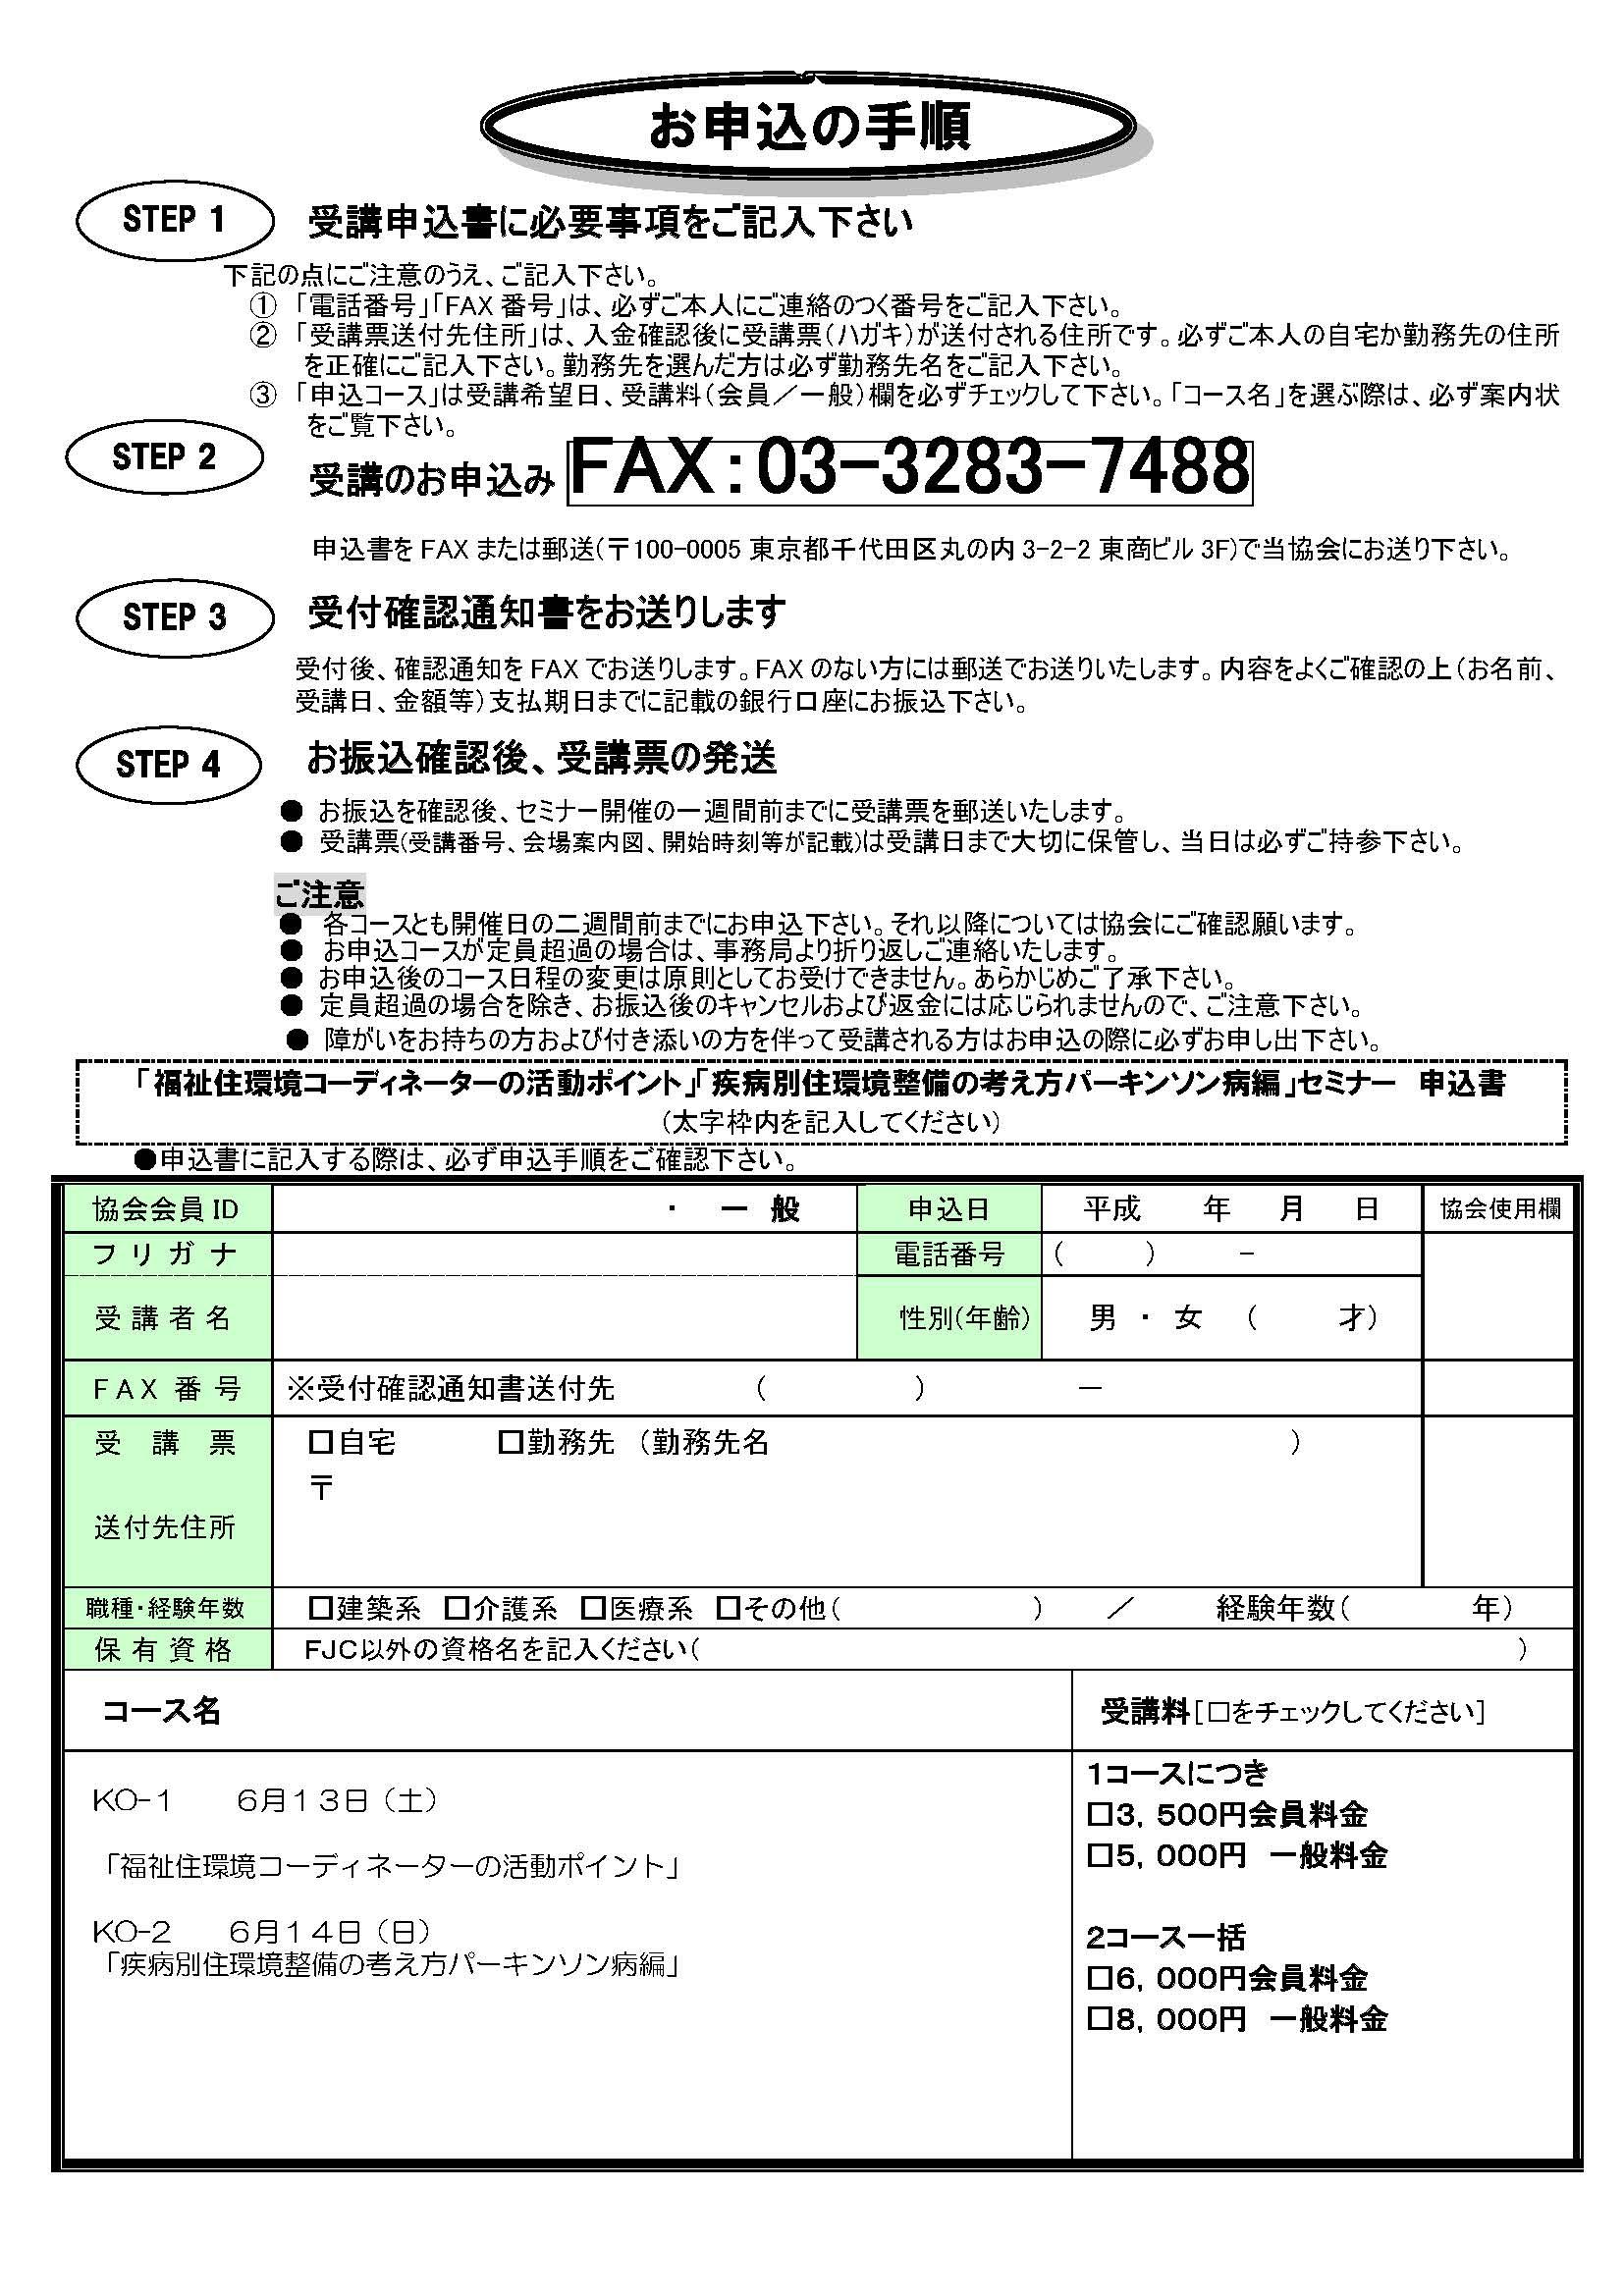 KO-1・CKO-2 FJCの活動ポイント・疾病別パーキンソン(高知)_ページ_2